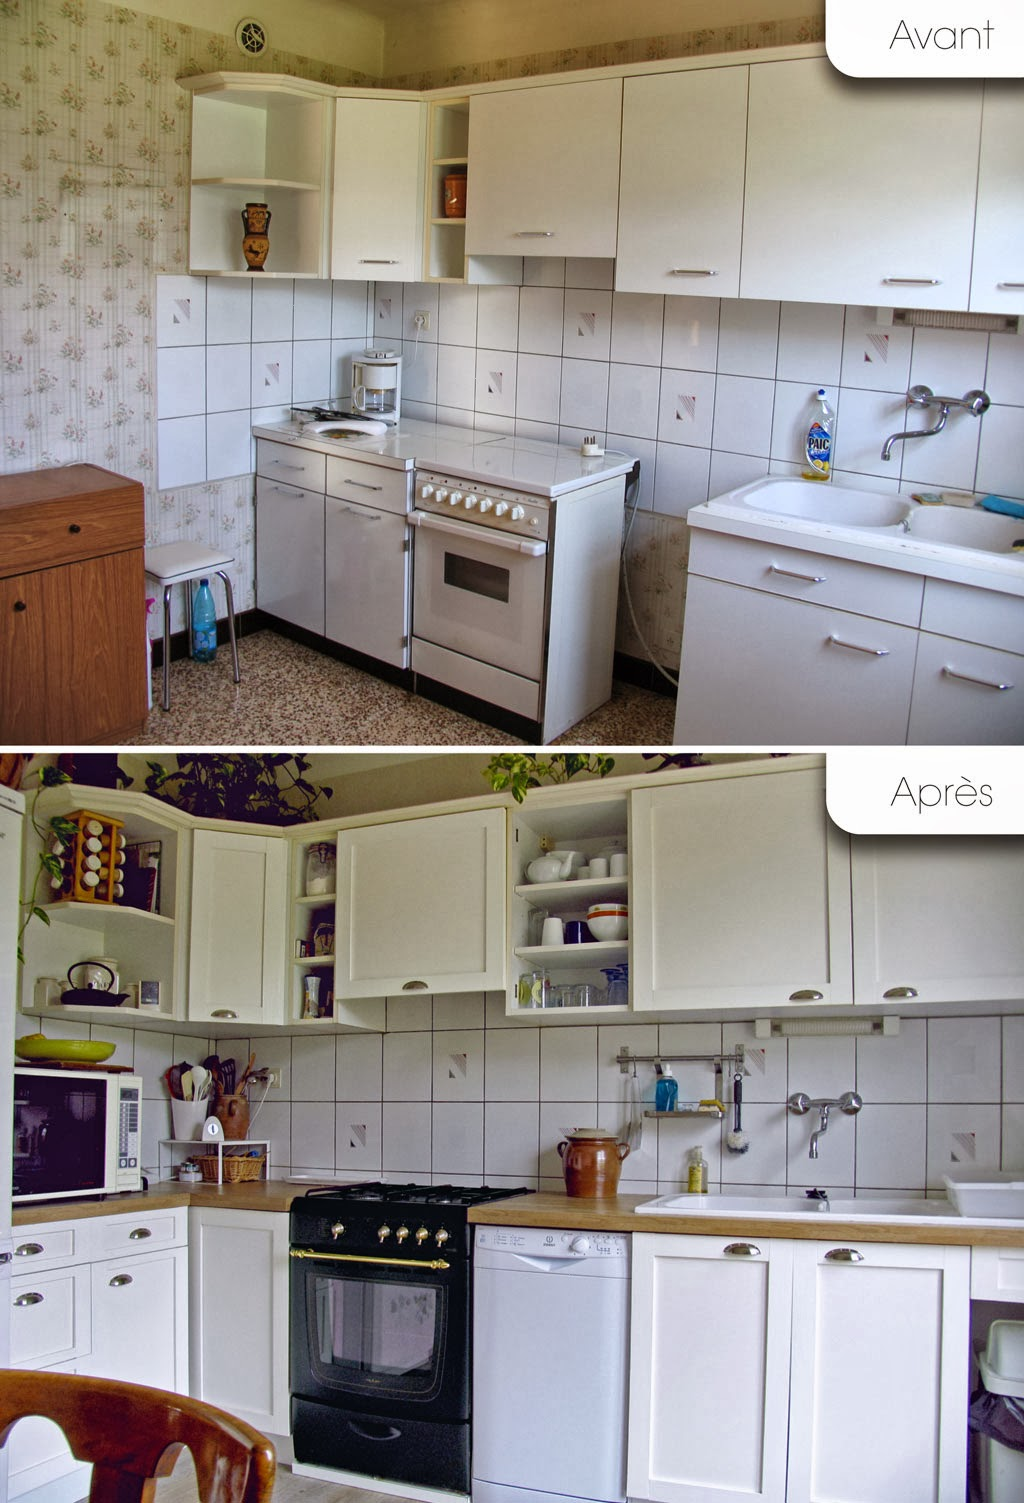 ma chambre claire notre cuisine avant apr s. Black Bedroom Furniture Sets. Home Design Ideas